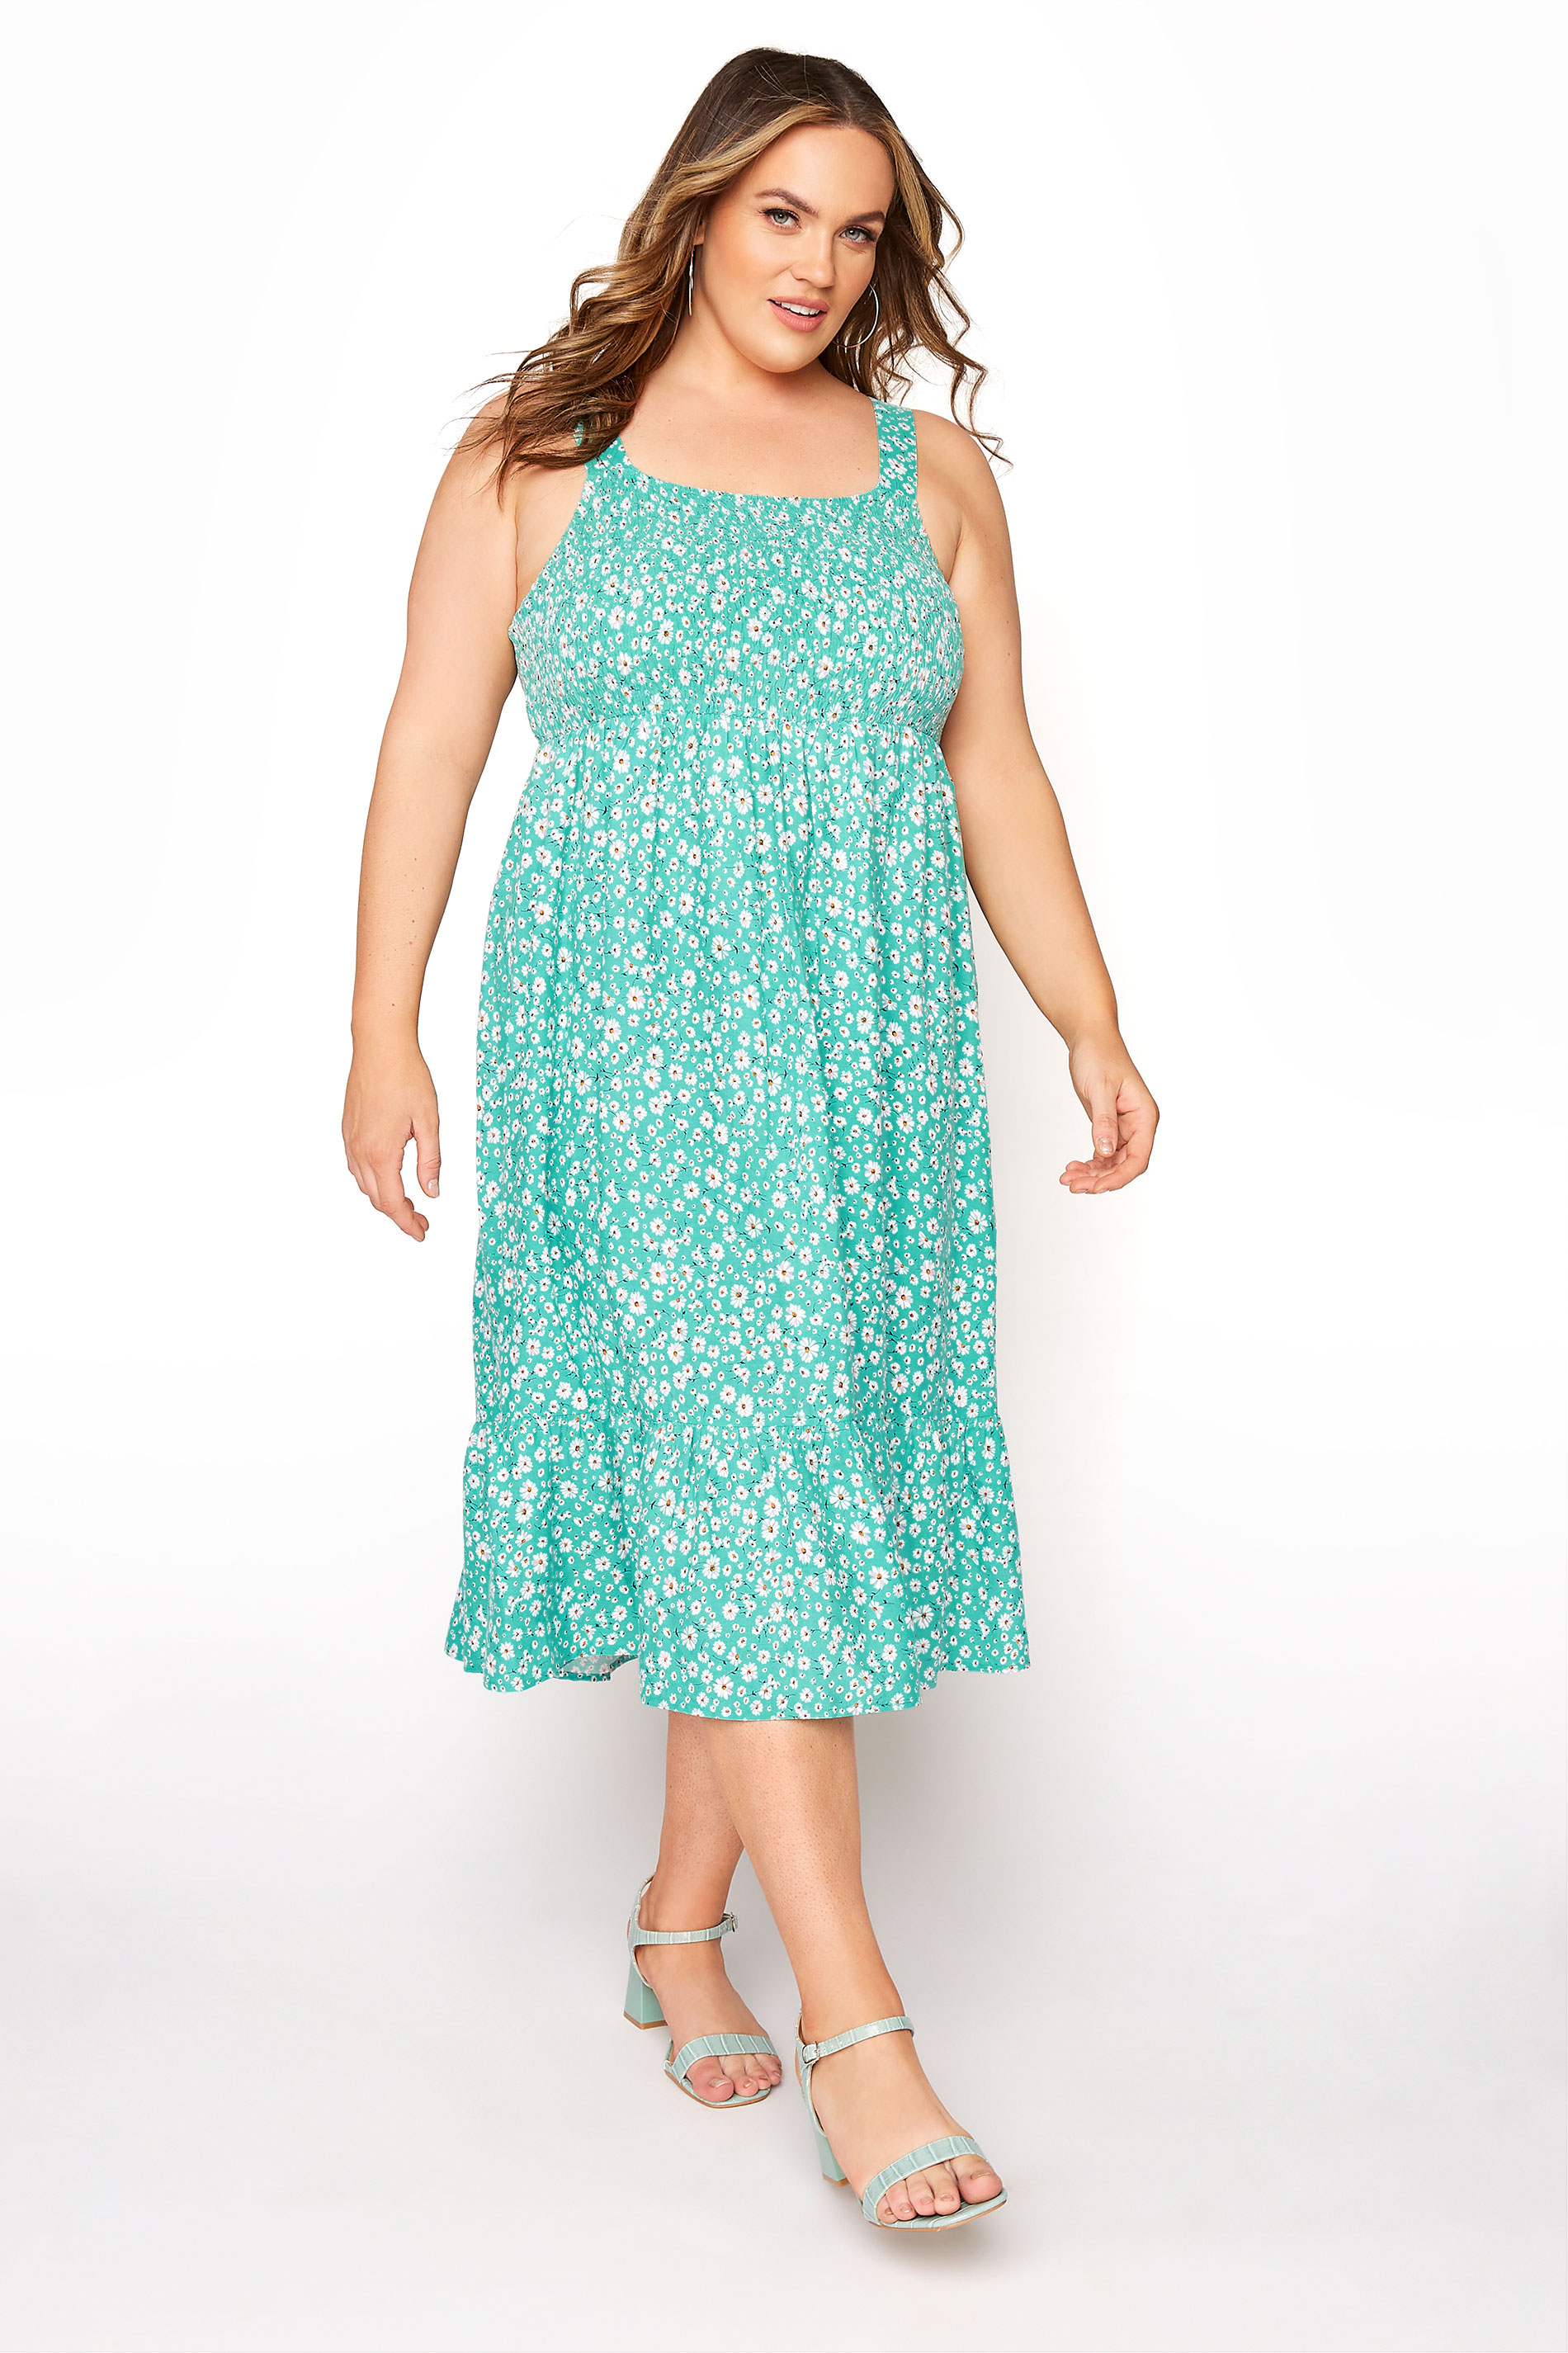 Green Floral Sleeveless Shirred Dress_A.jpg